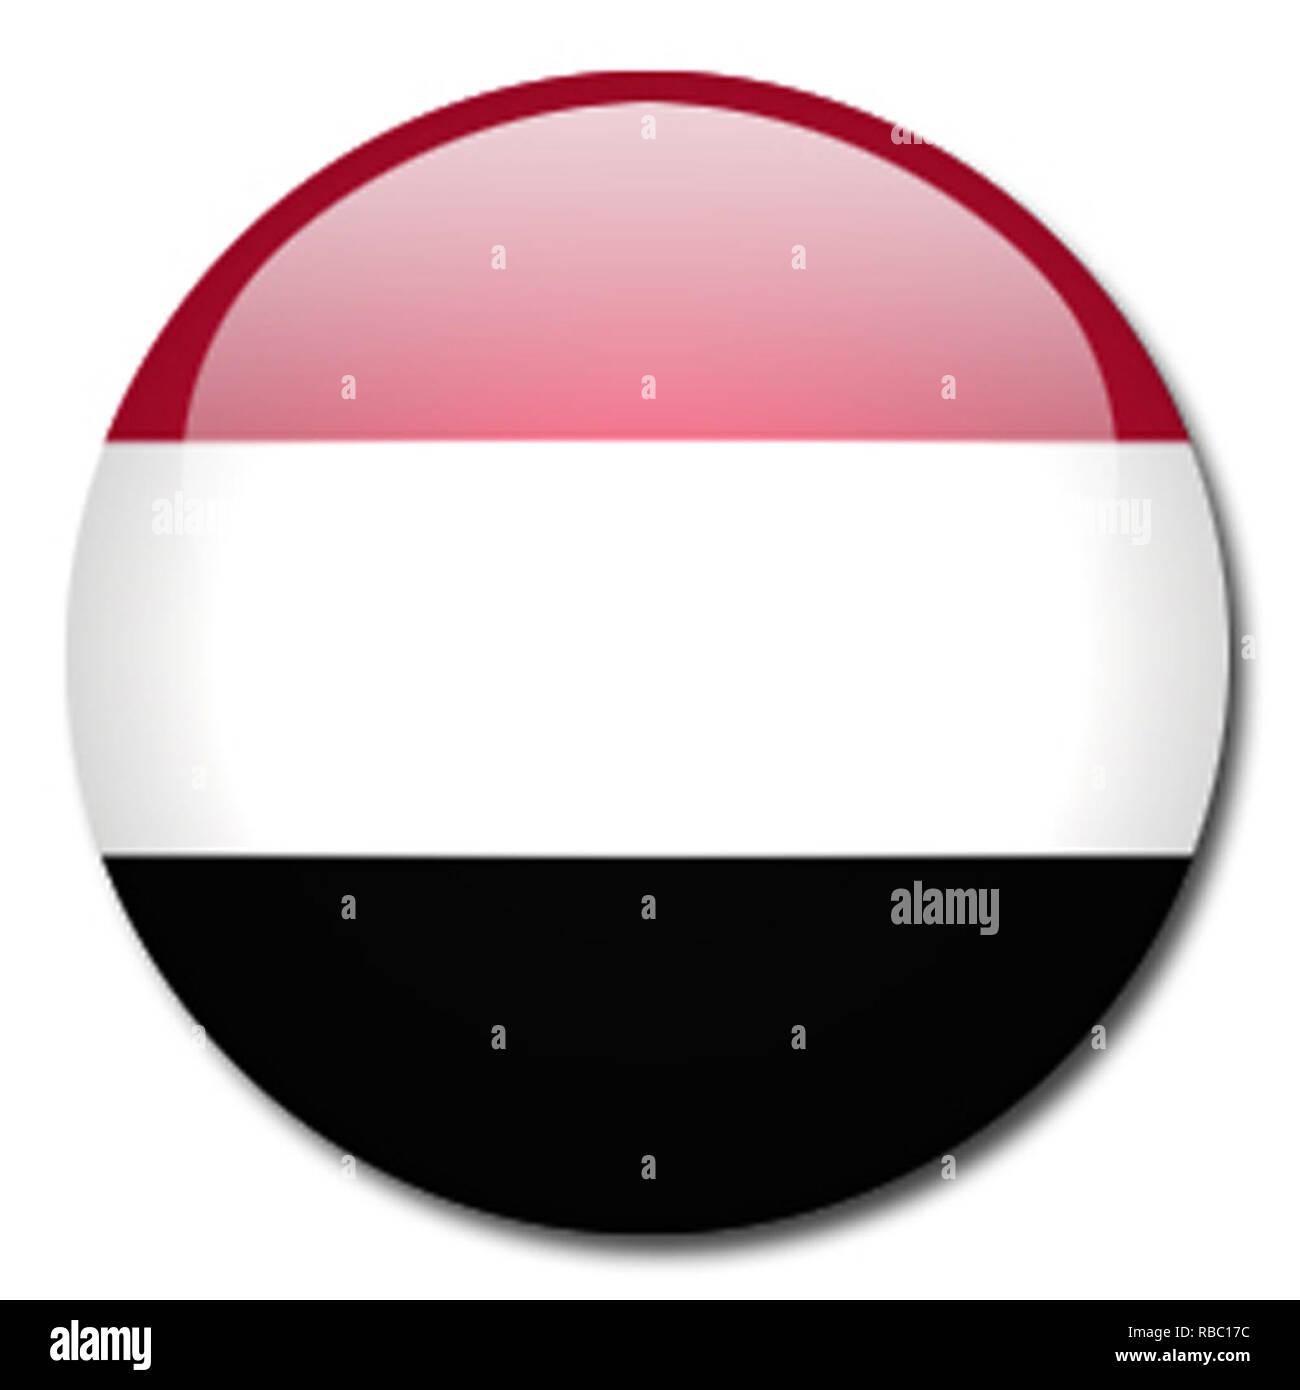 yemen flag - Stock Image